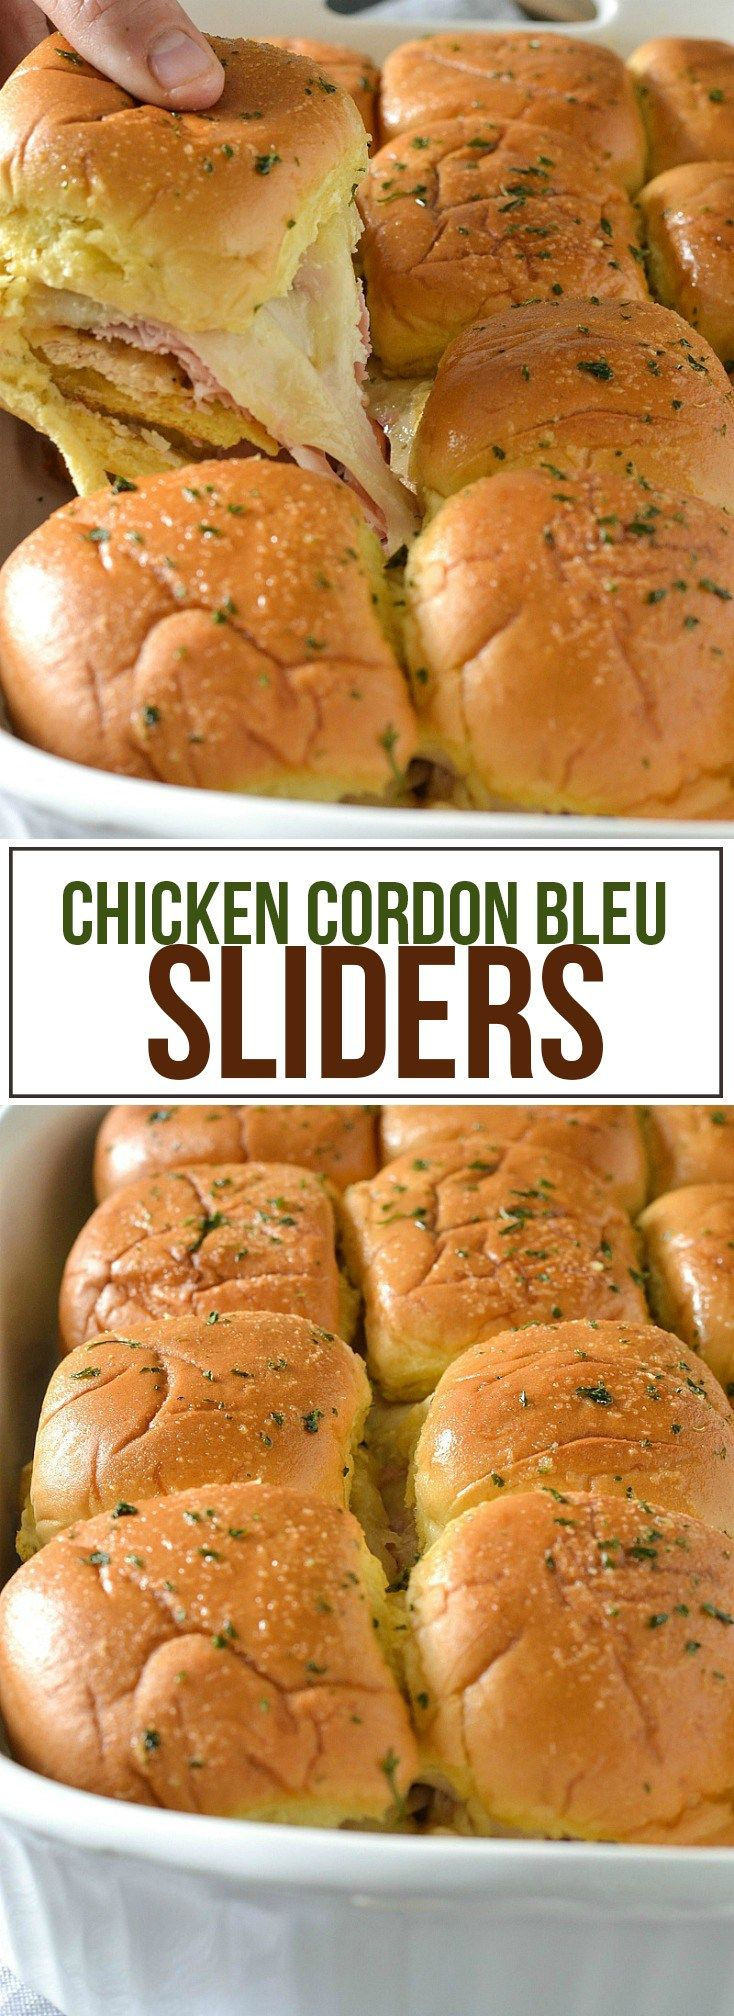 #ad Chicken Cordon Bleu Sliders